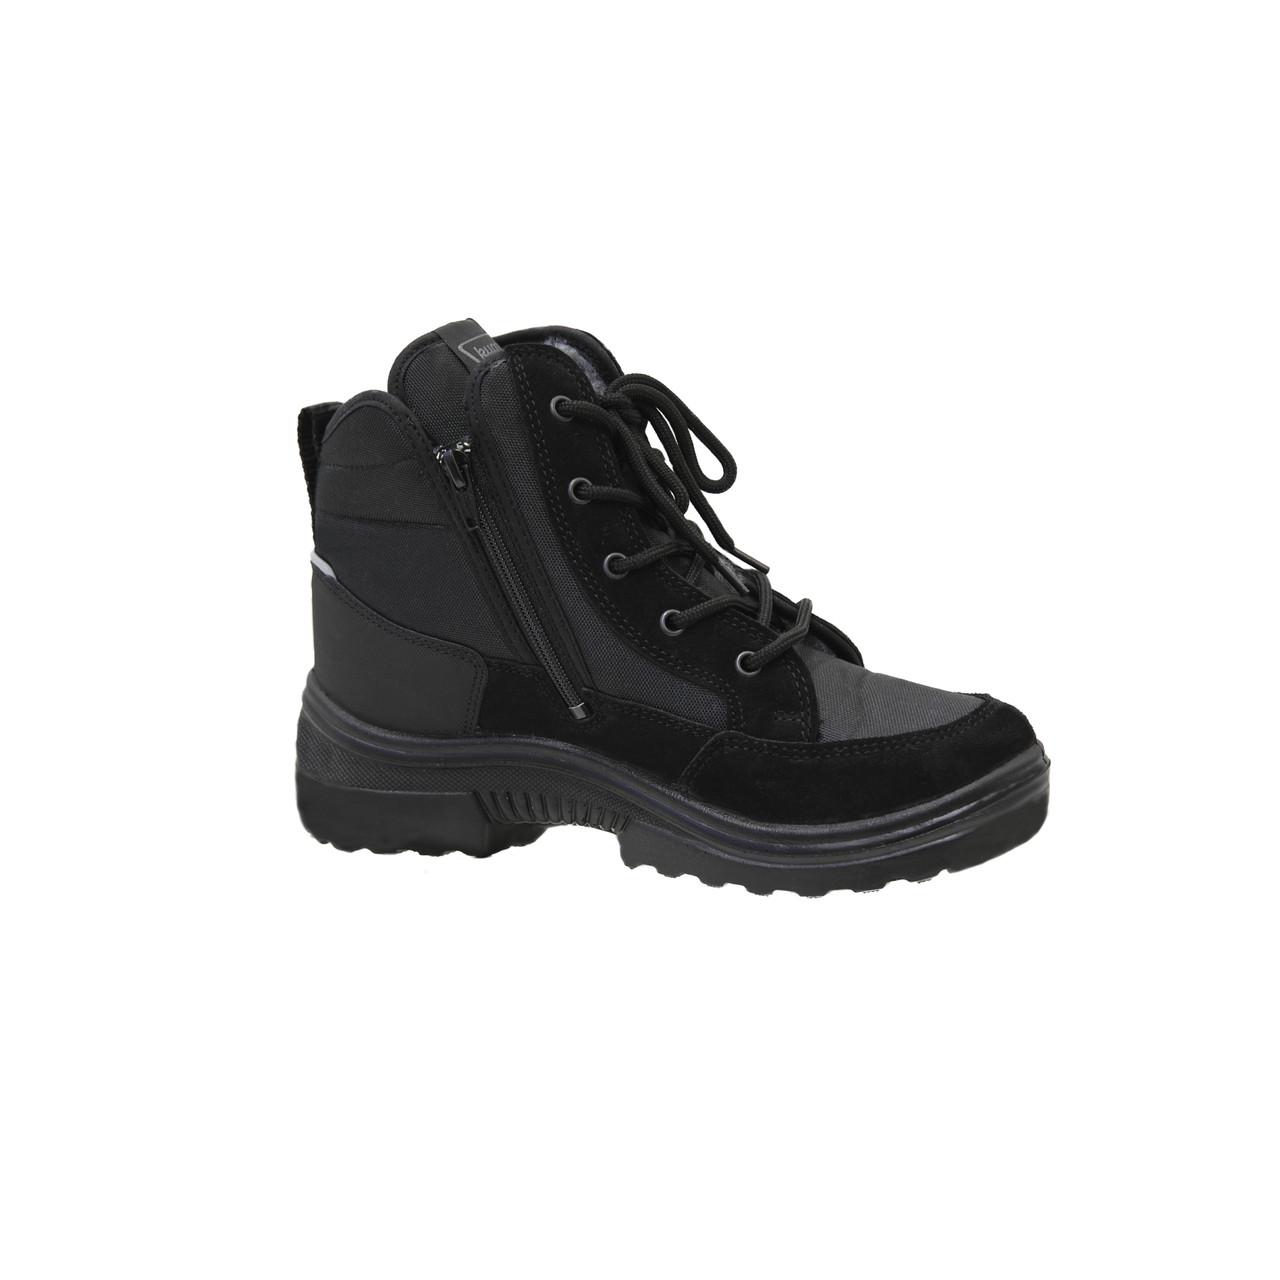 Обувь взрослая Kuoma Trekking V, Black/Black - 38